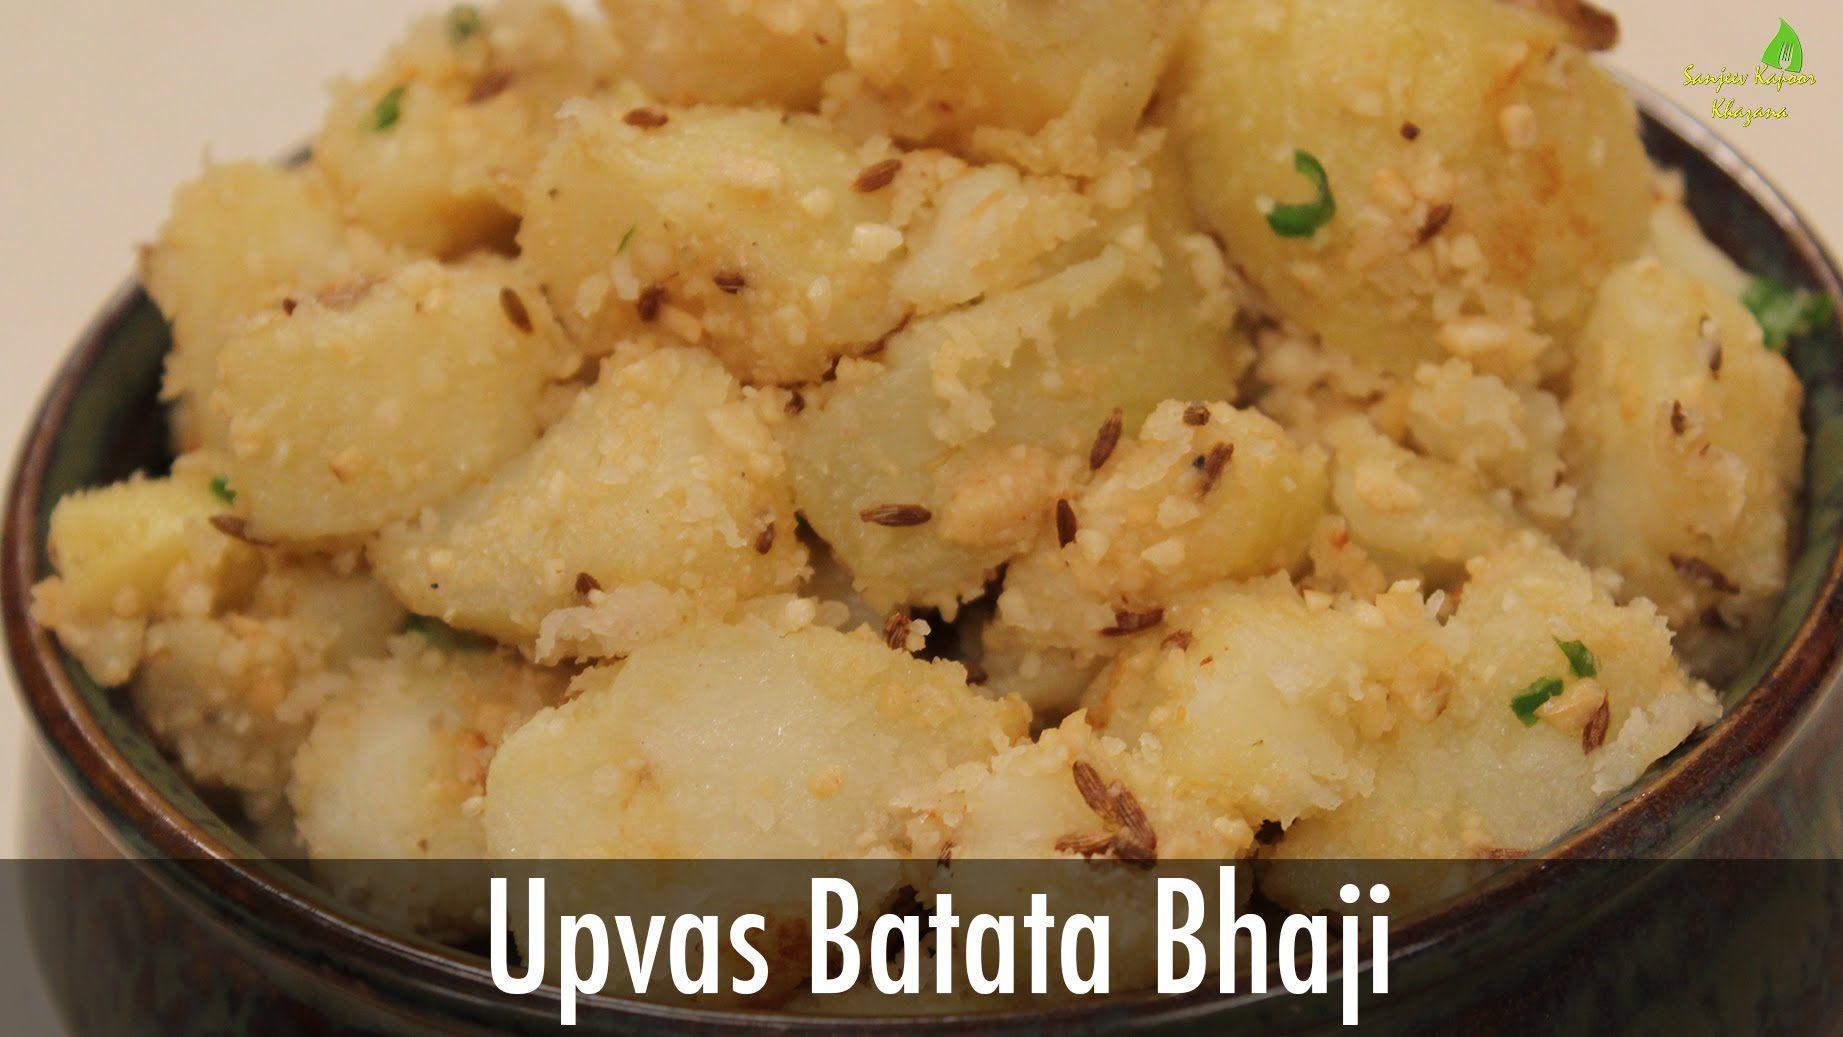 Upvas batata bhaji snacks recipe sanjeev kapoor khazana foods upvas batata bhaji snacks recipe sanjeev kapoor khazana forumfinder Images